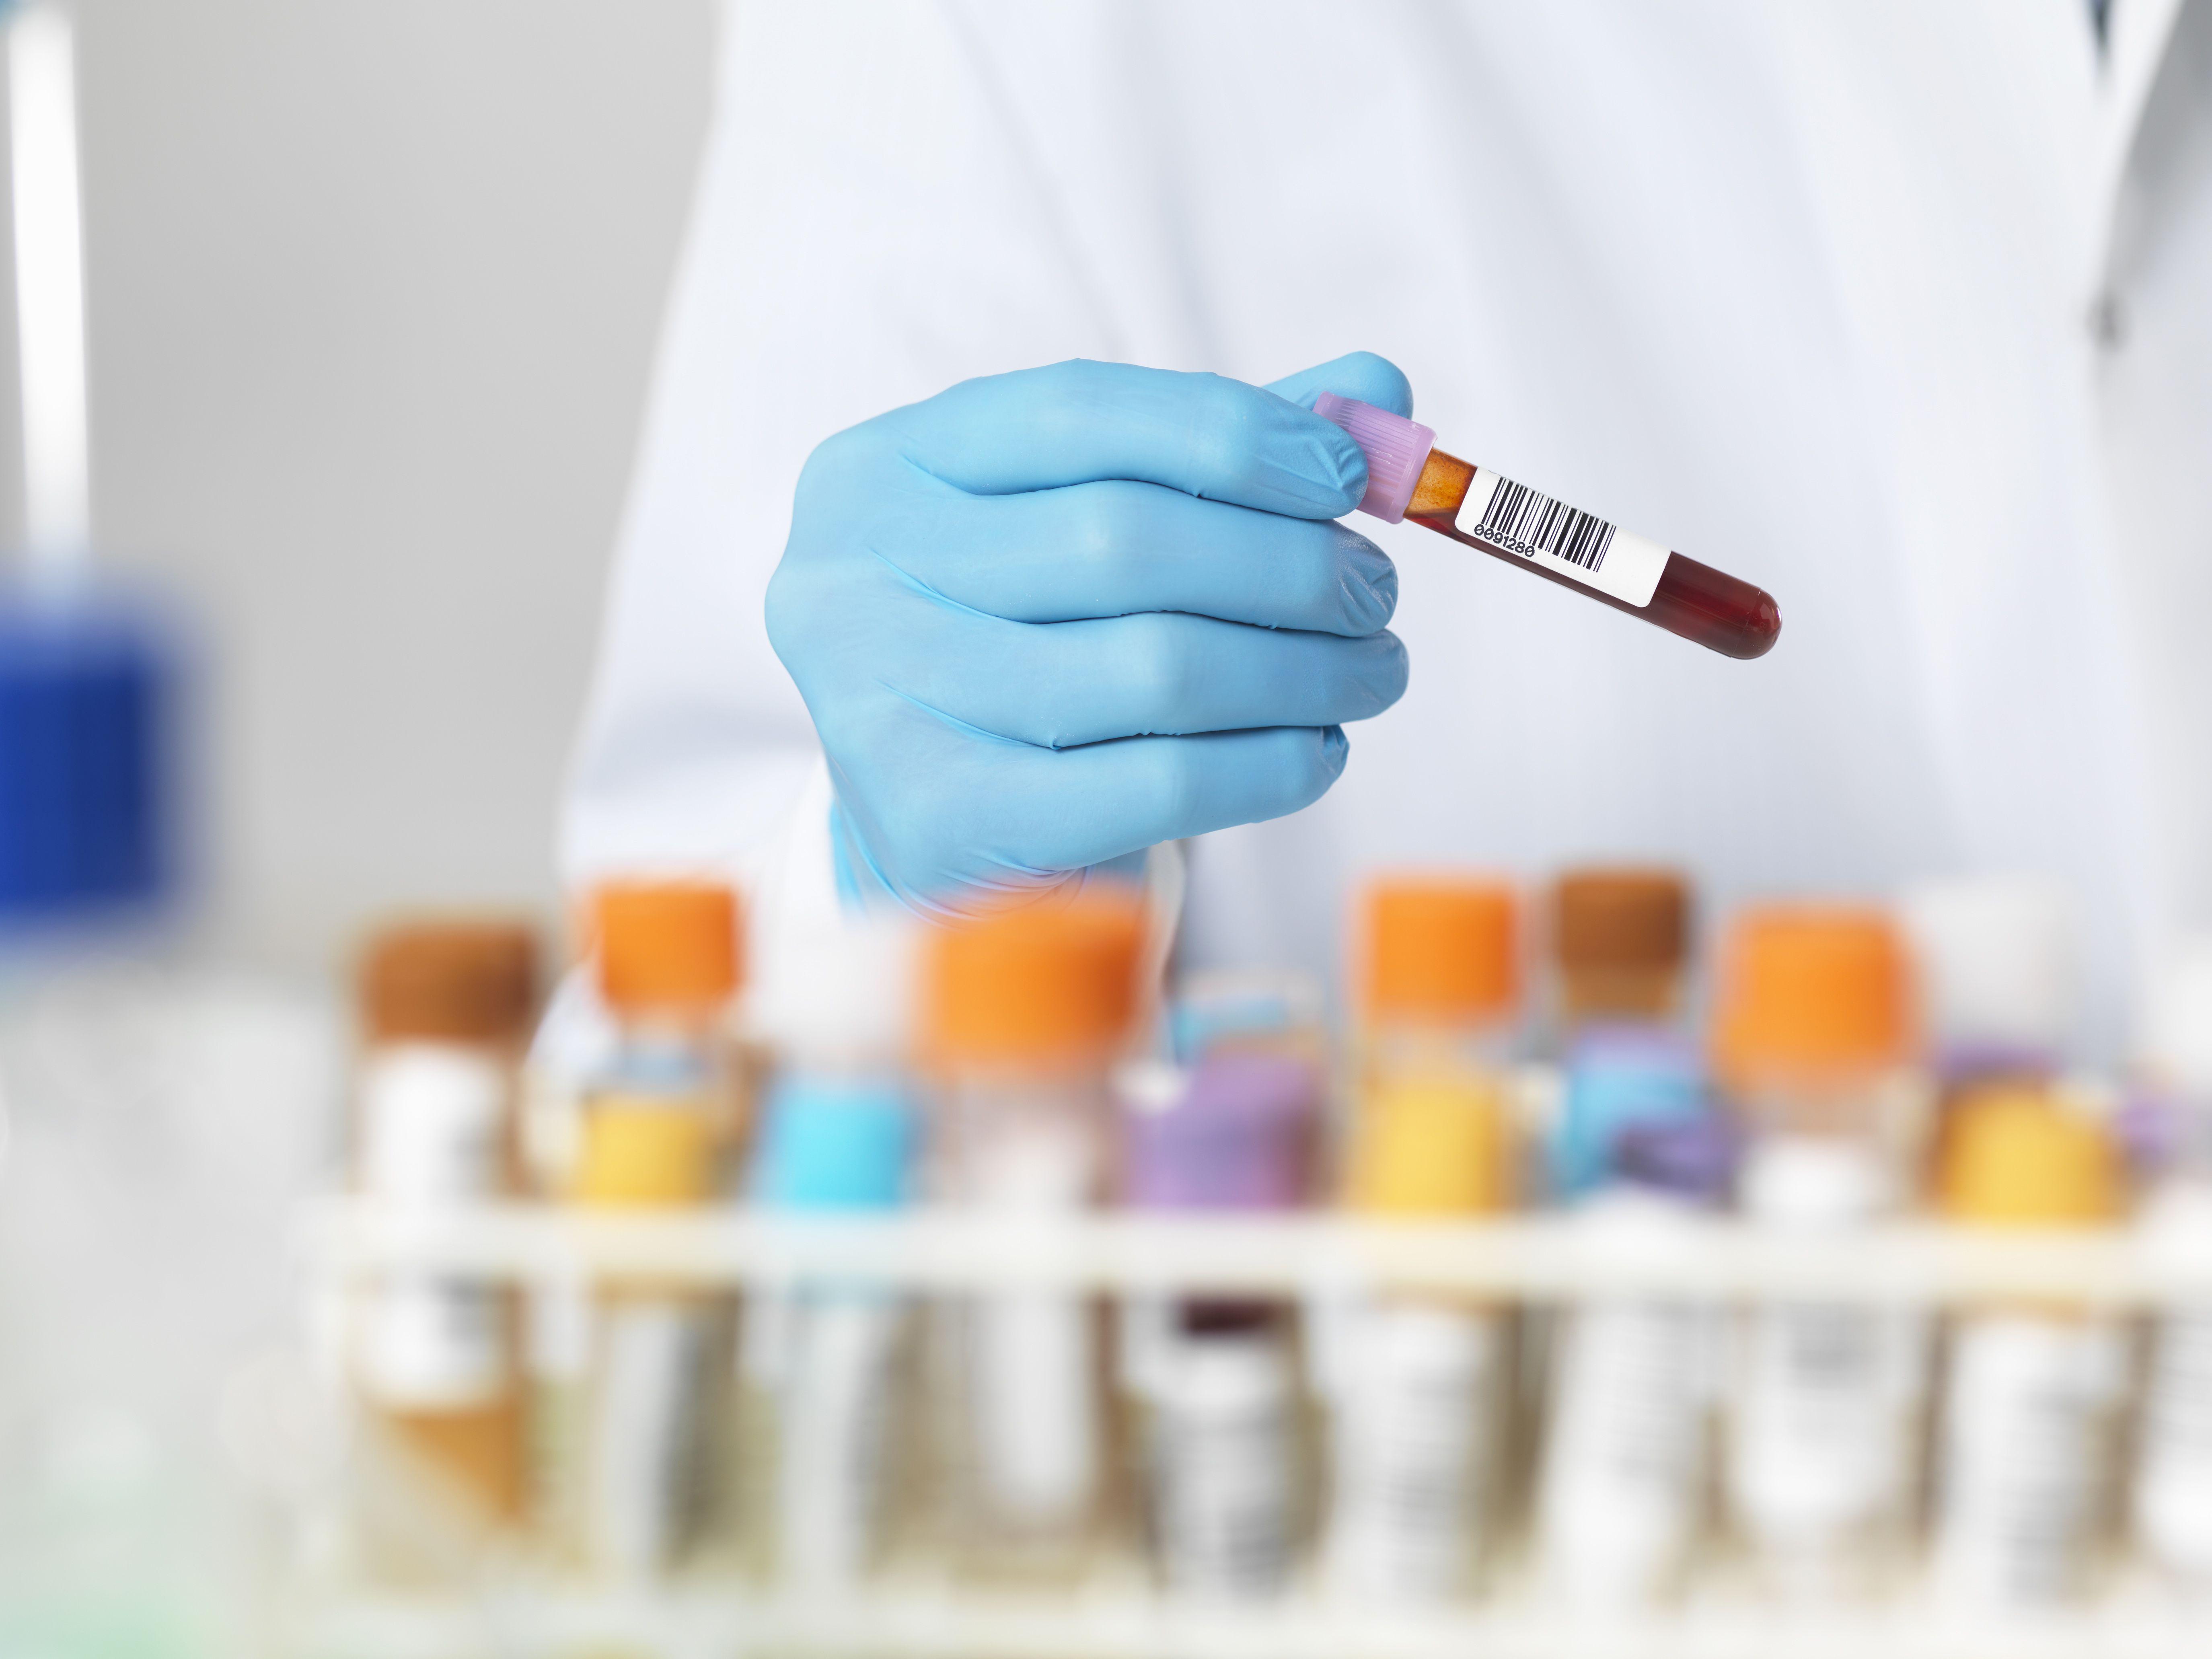 Tcs Medical Test Format on